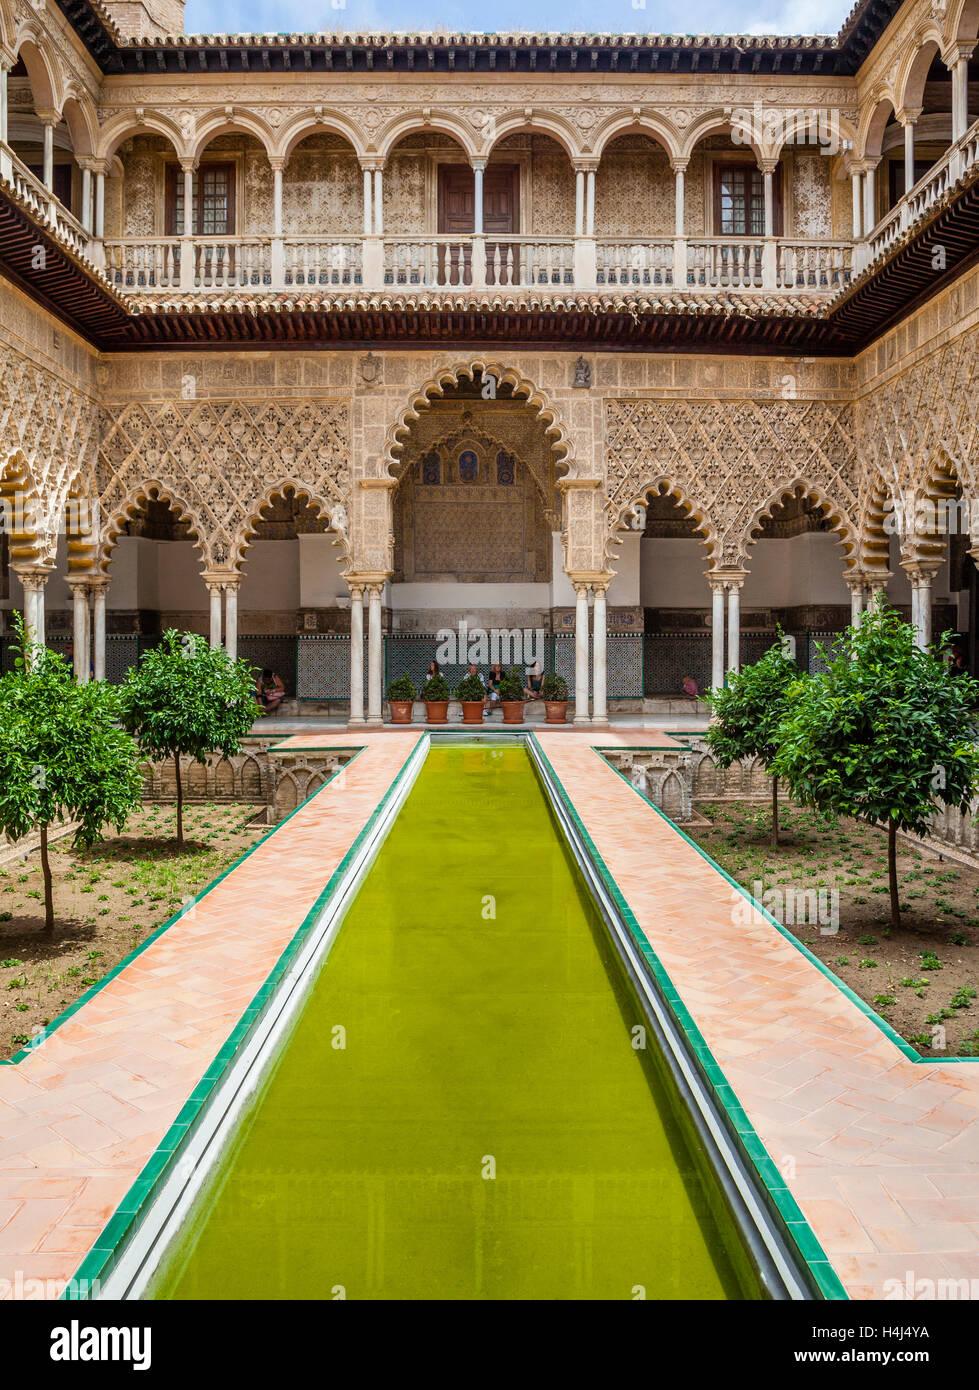 Spanien, Andalusien, Provinz Sevilla, Sevilla, Alcazar, Patio de Las Huasaco, Innenhof der Jungfrauen Stockbild